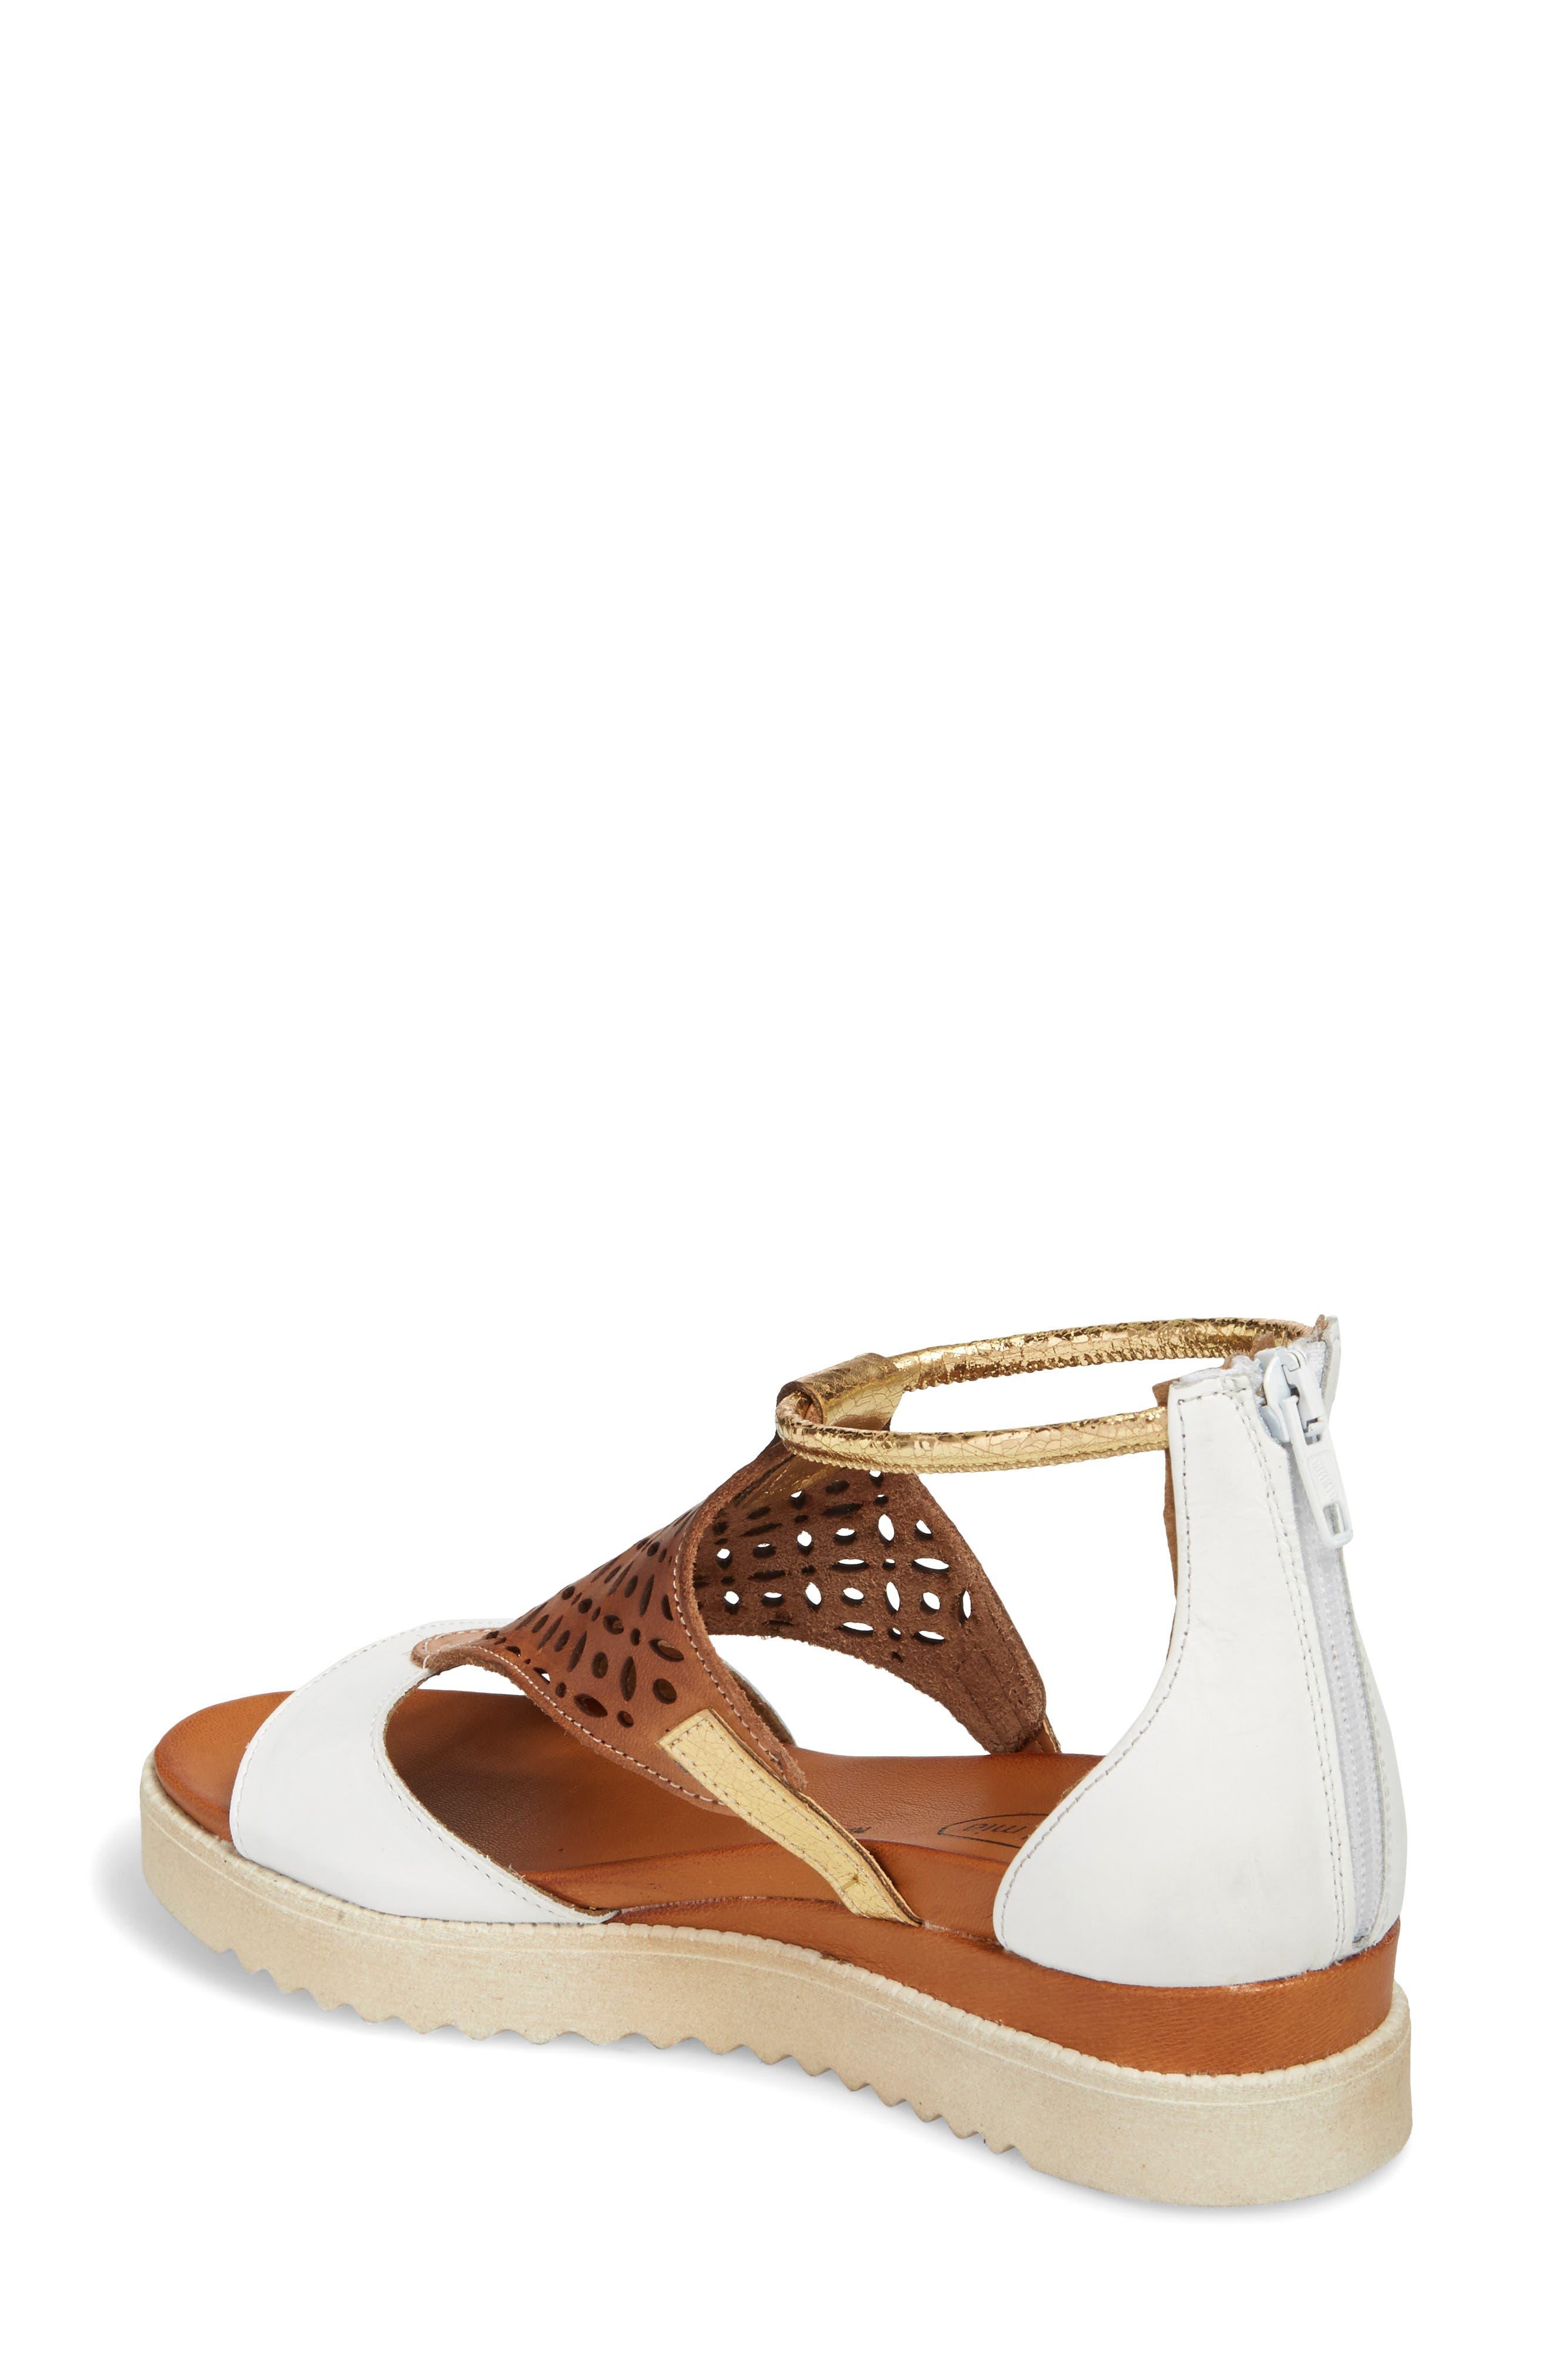 Blaze Sandal,                             Alternate thumbnail 2, color,                             White Combo Leather